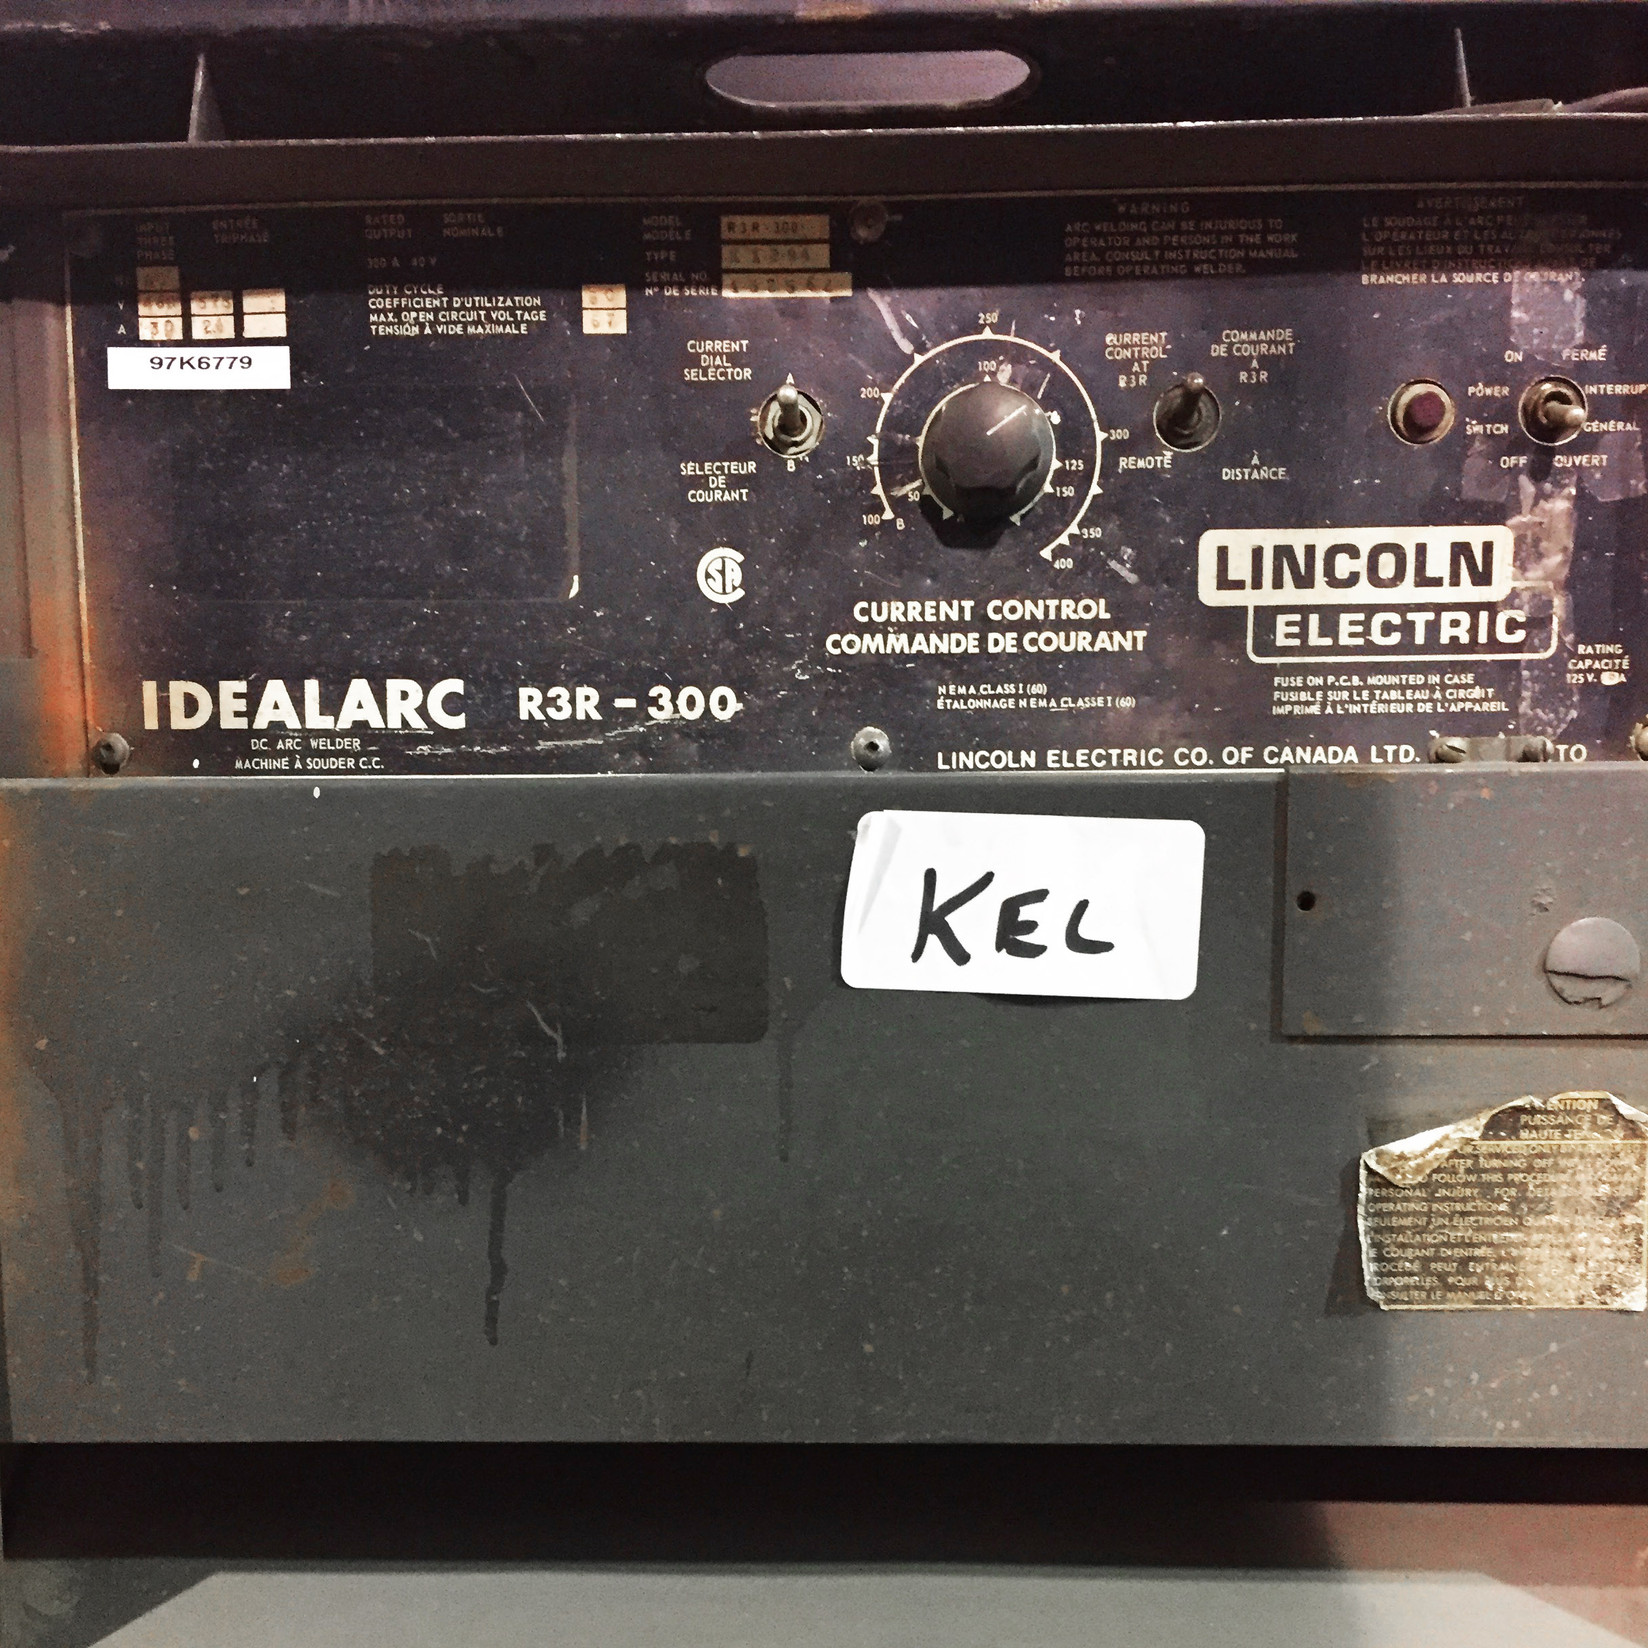 LIncoln IdealArc R3R-300